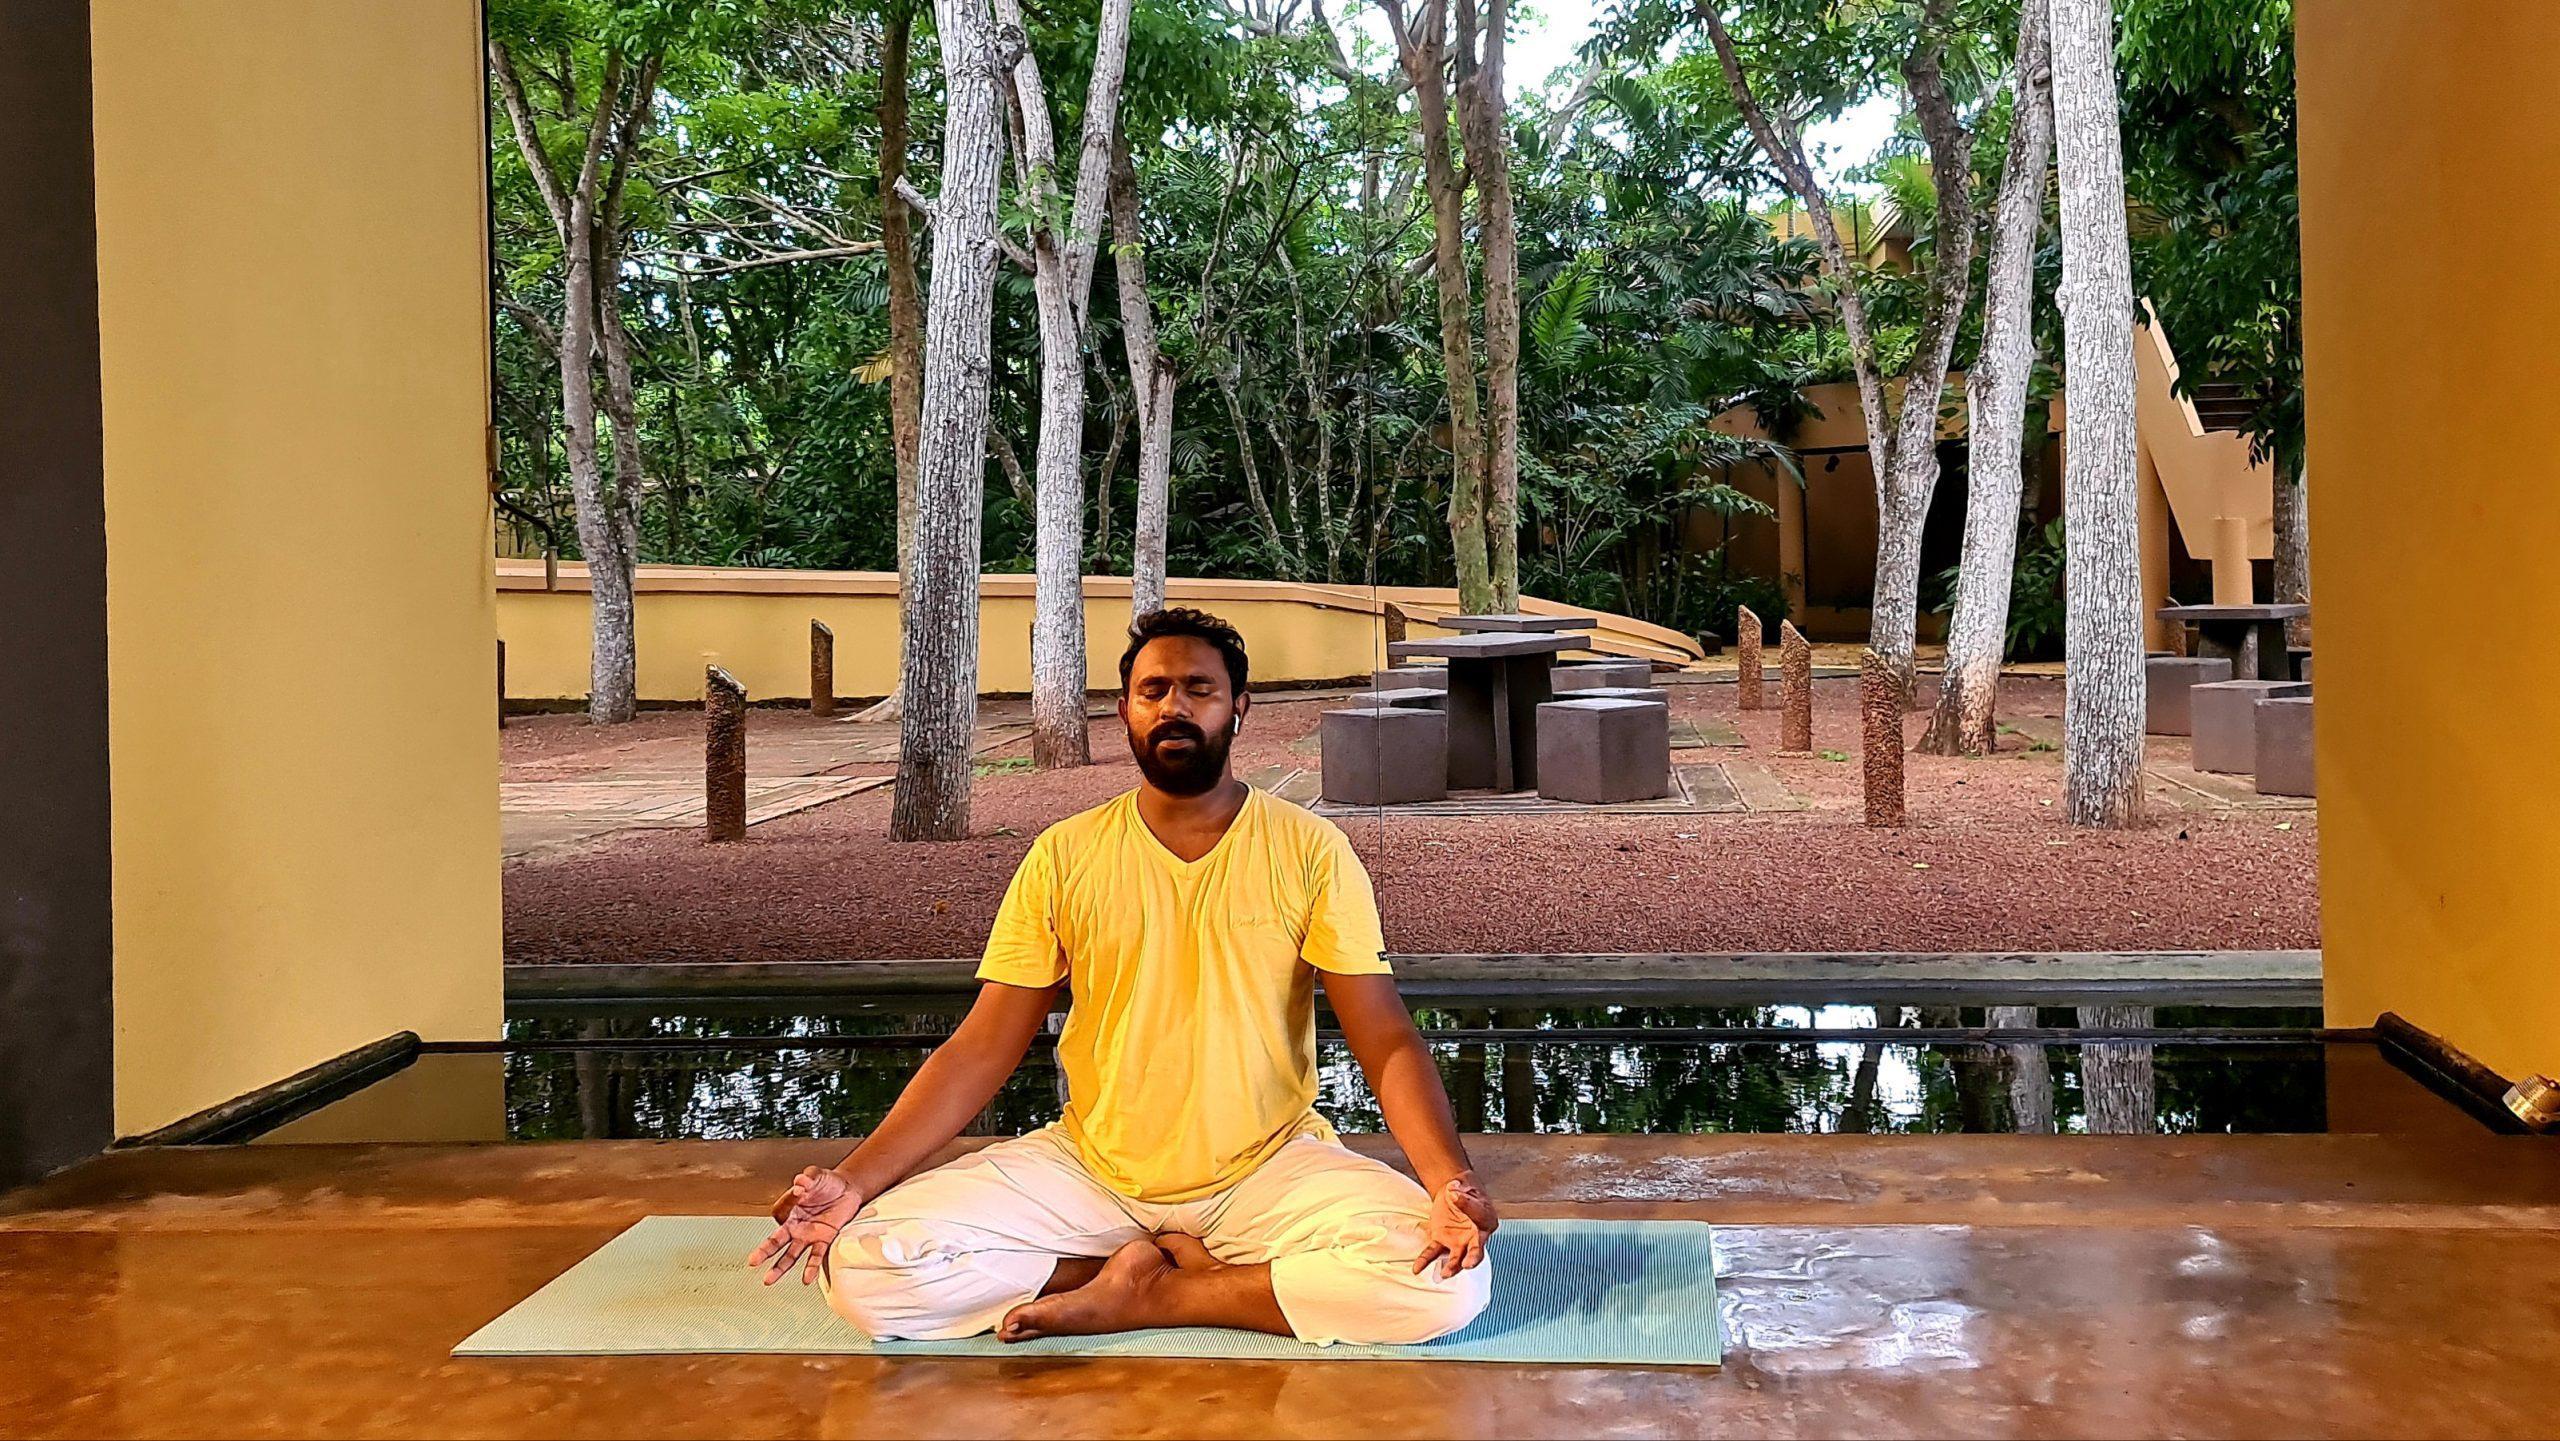 Amesh seated in cross legged Yoga asana